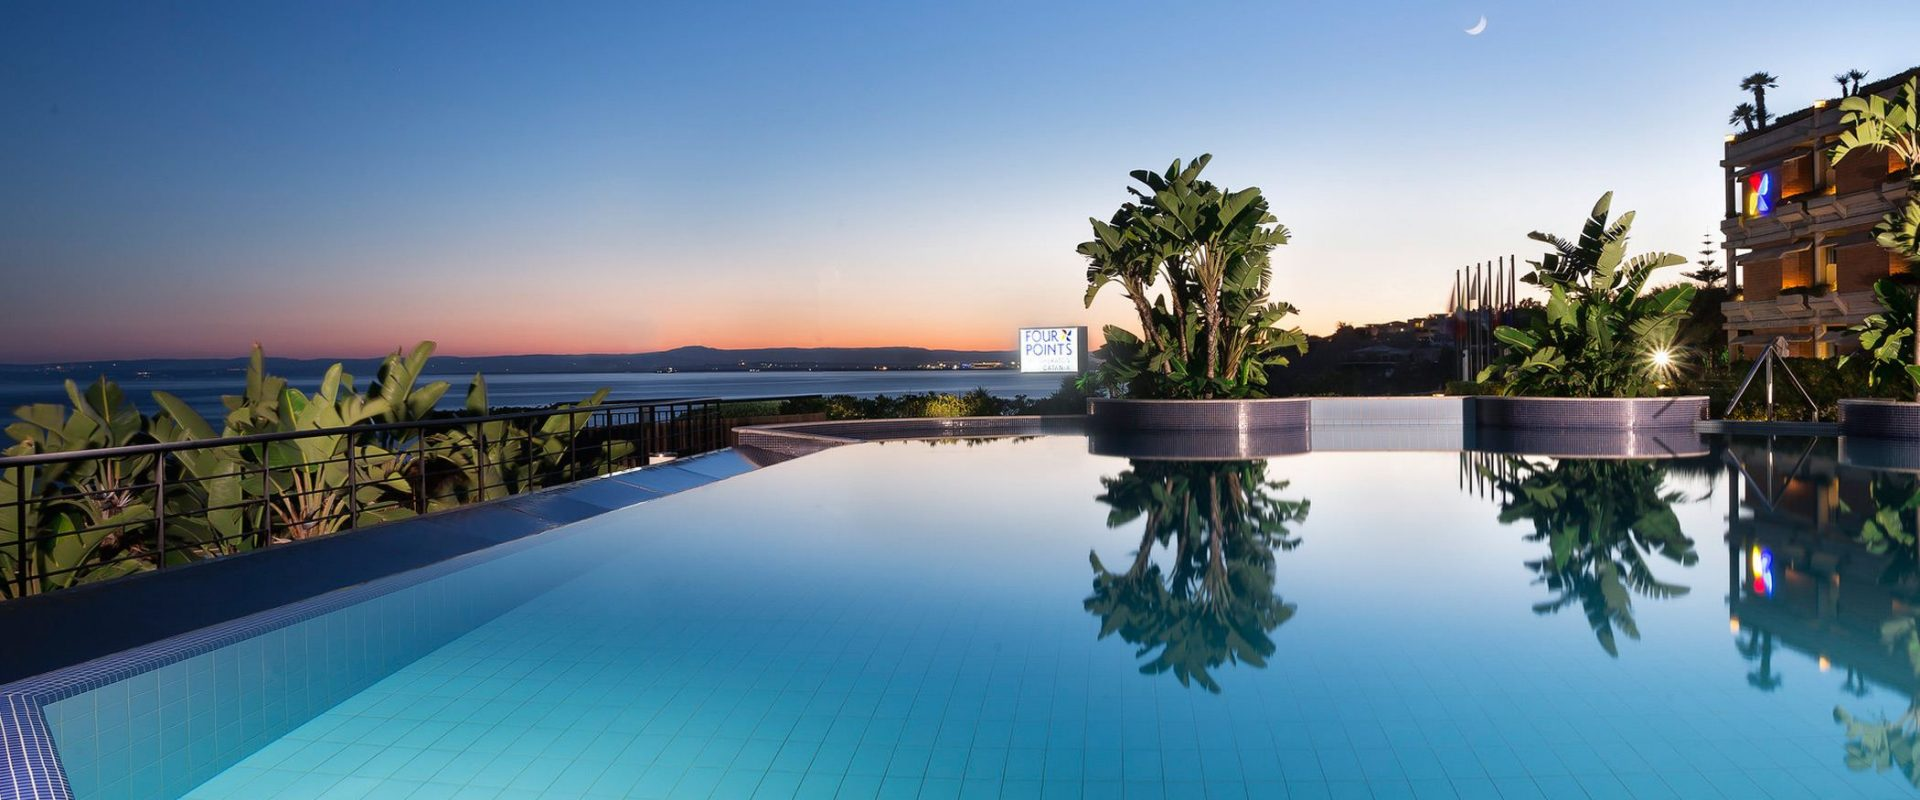 Explore-Italy-Hotel-Four-Points-Sheraton-Catania-Hotel-Pool-Sunset